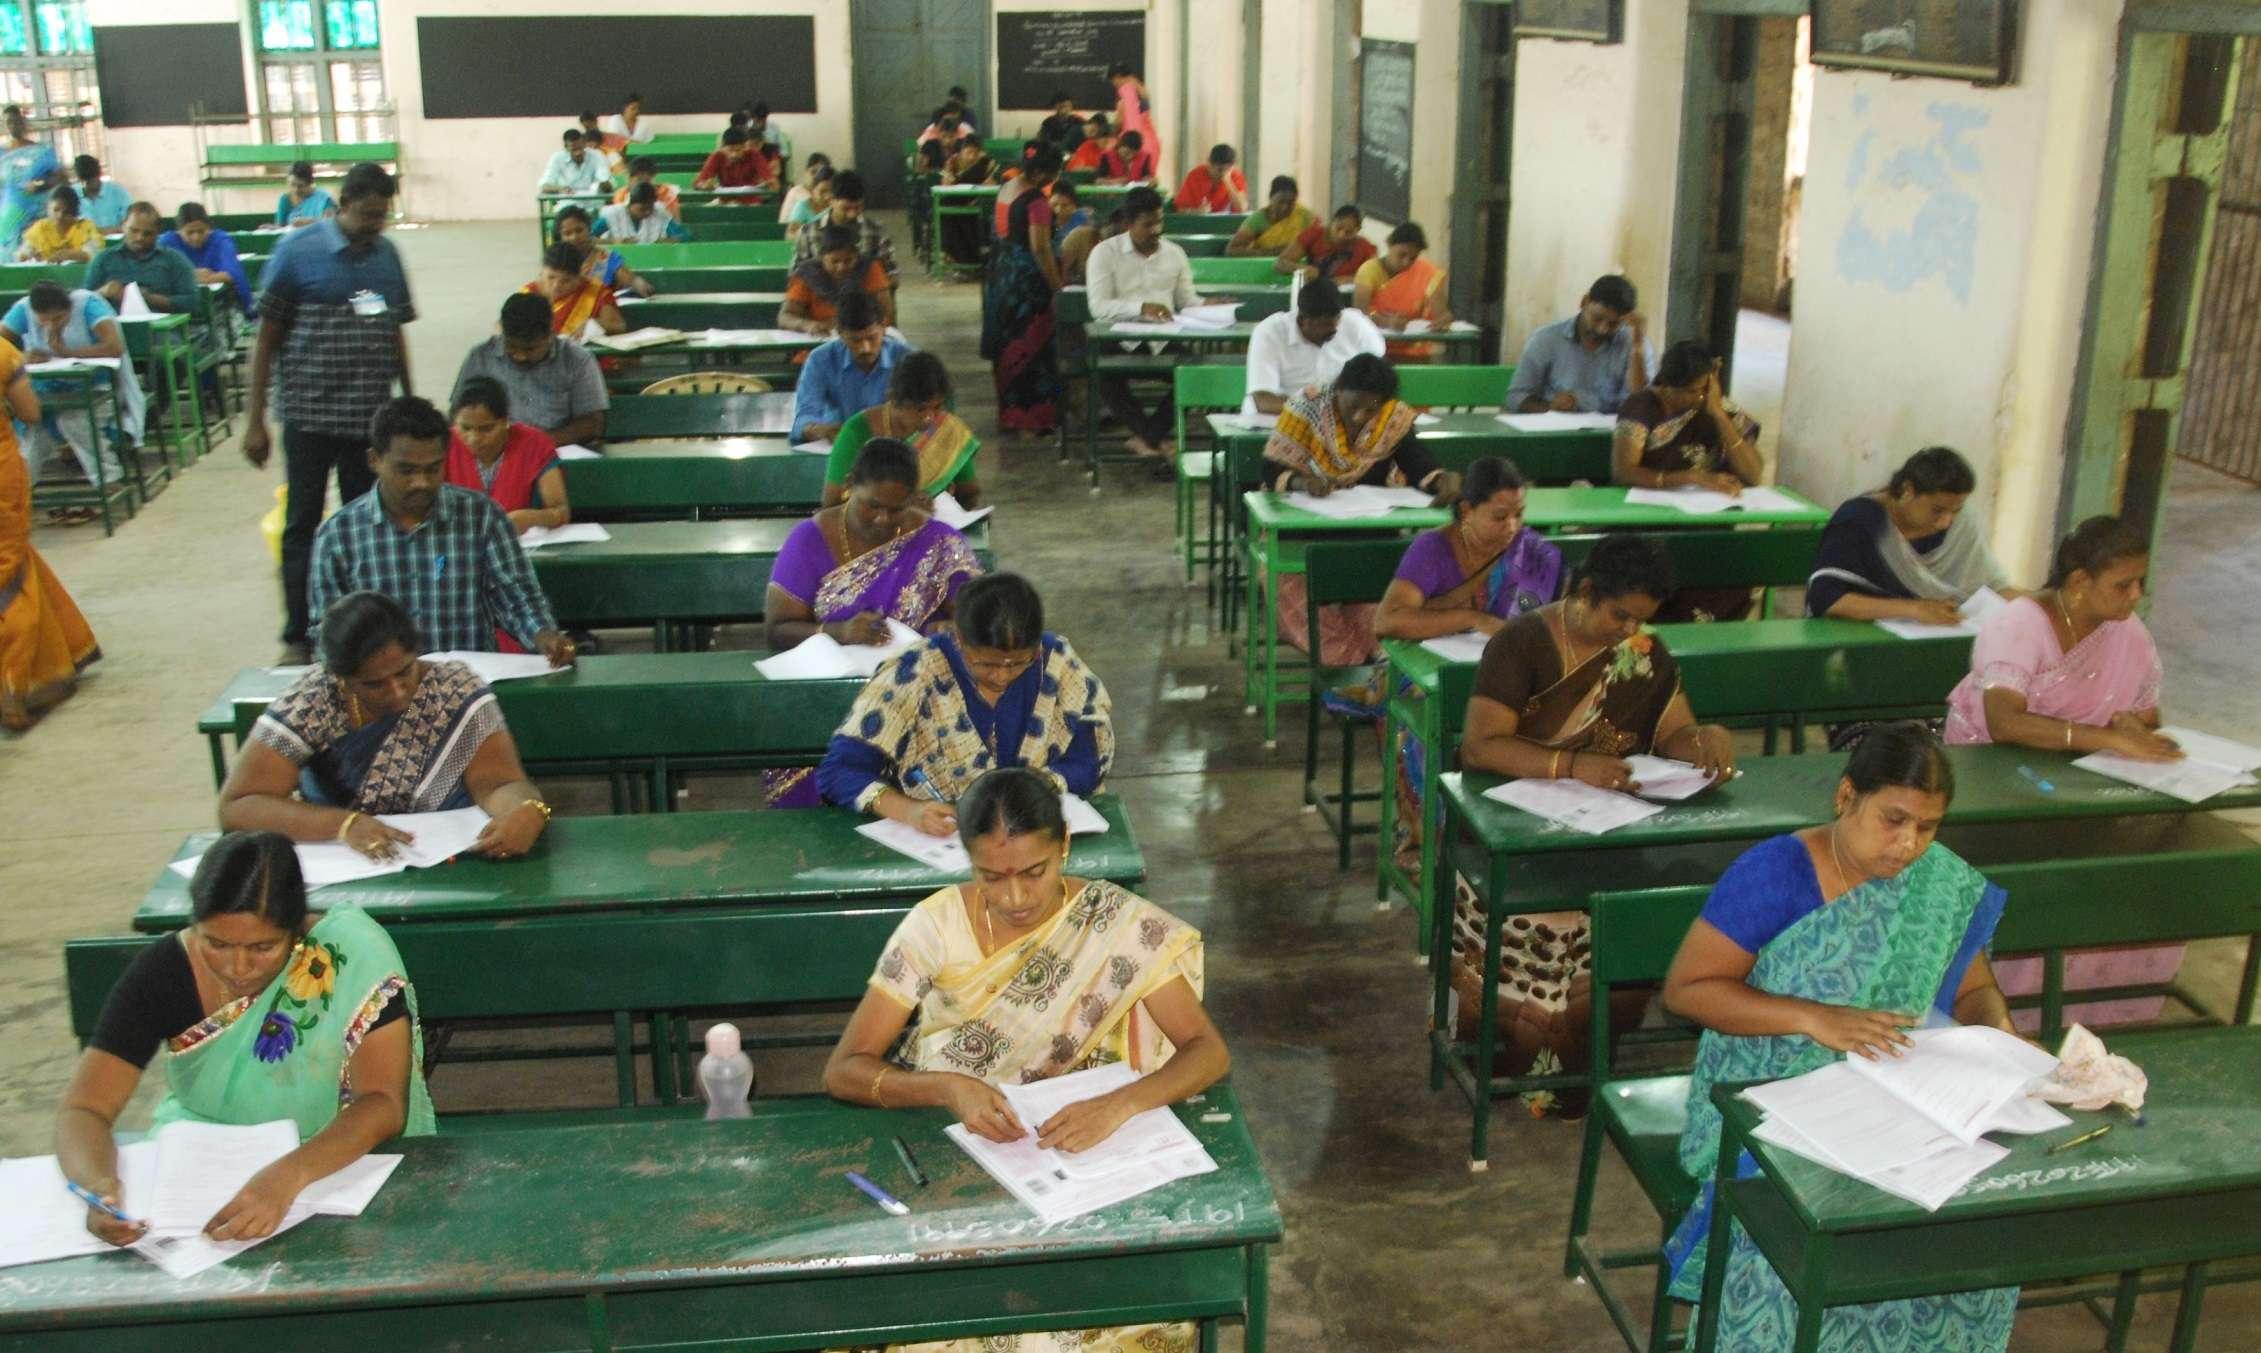 CTET 2019: More than 25 lakh candidates to write CTET on December 8